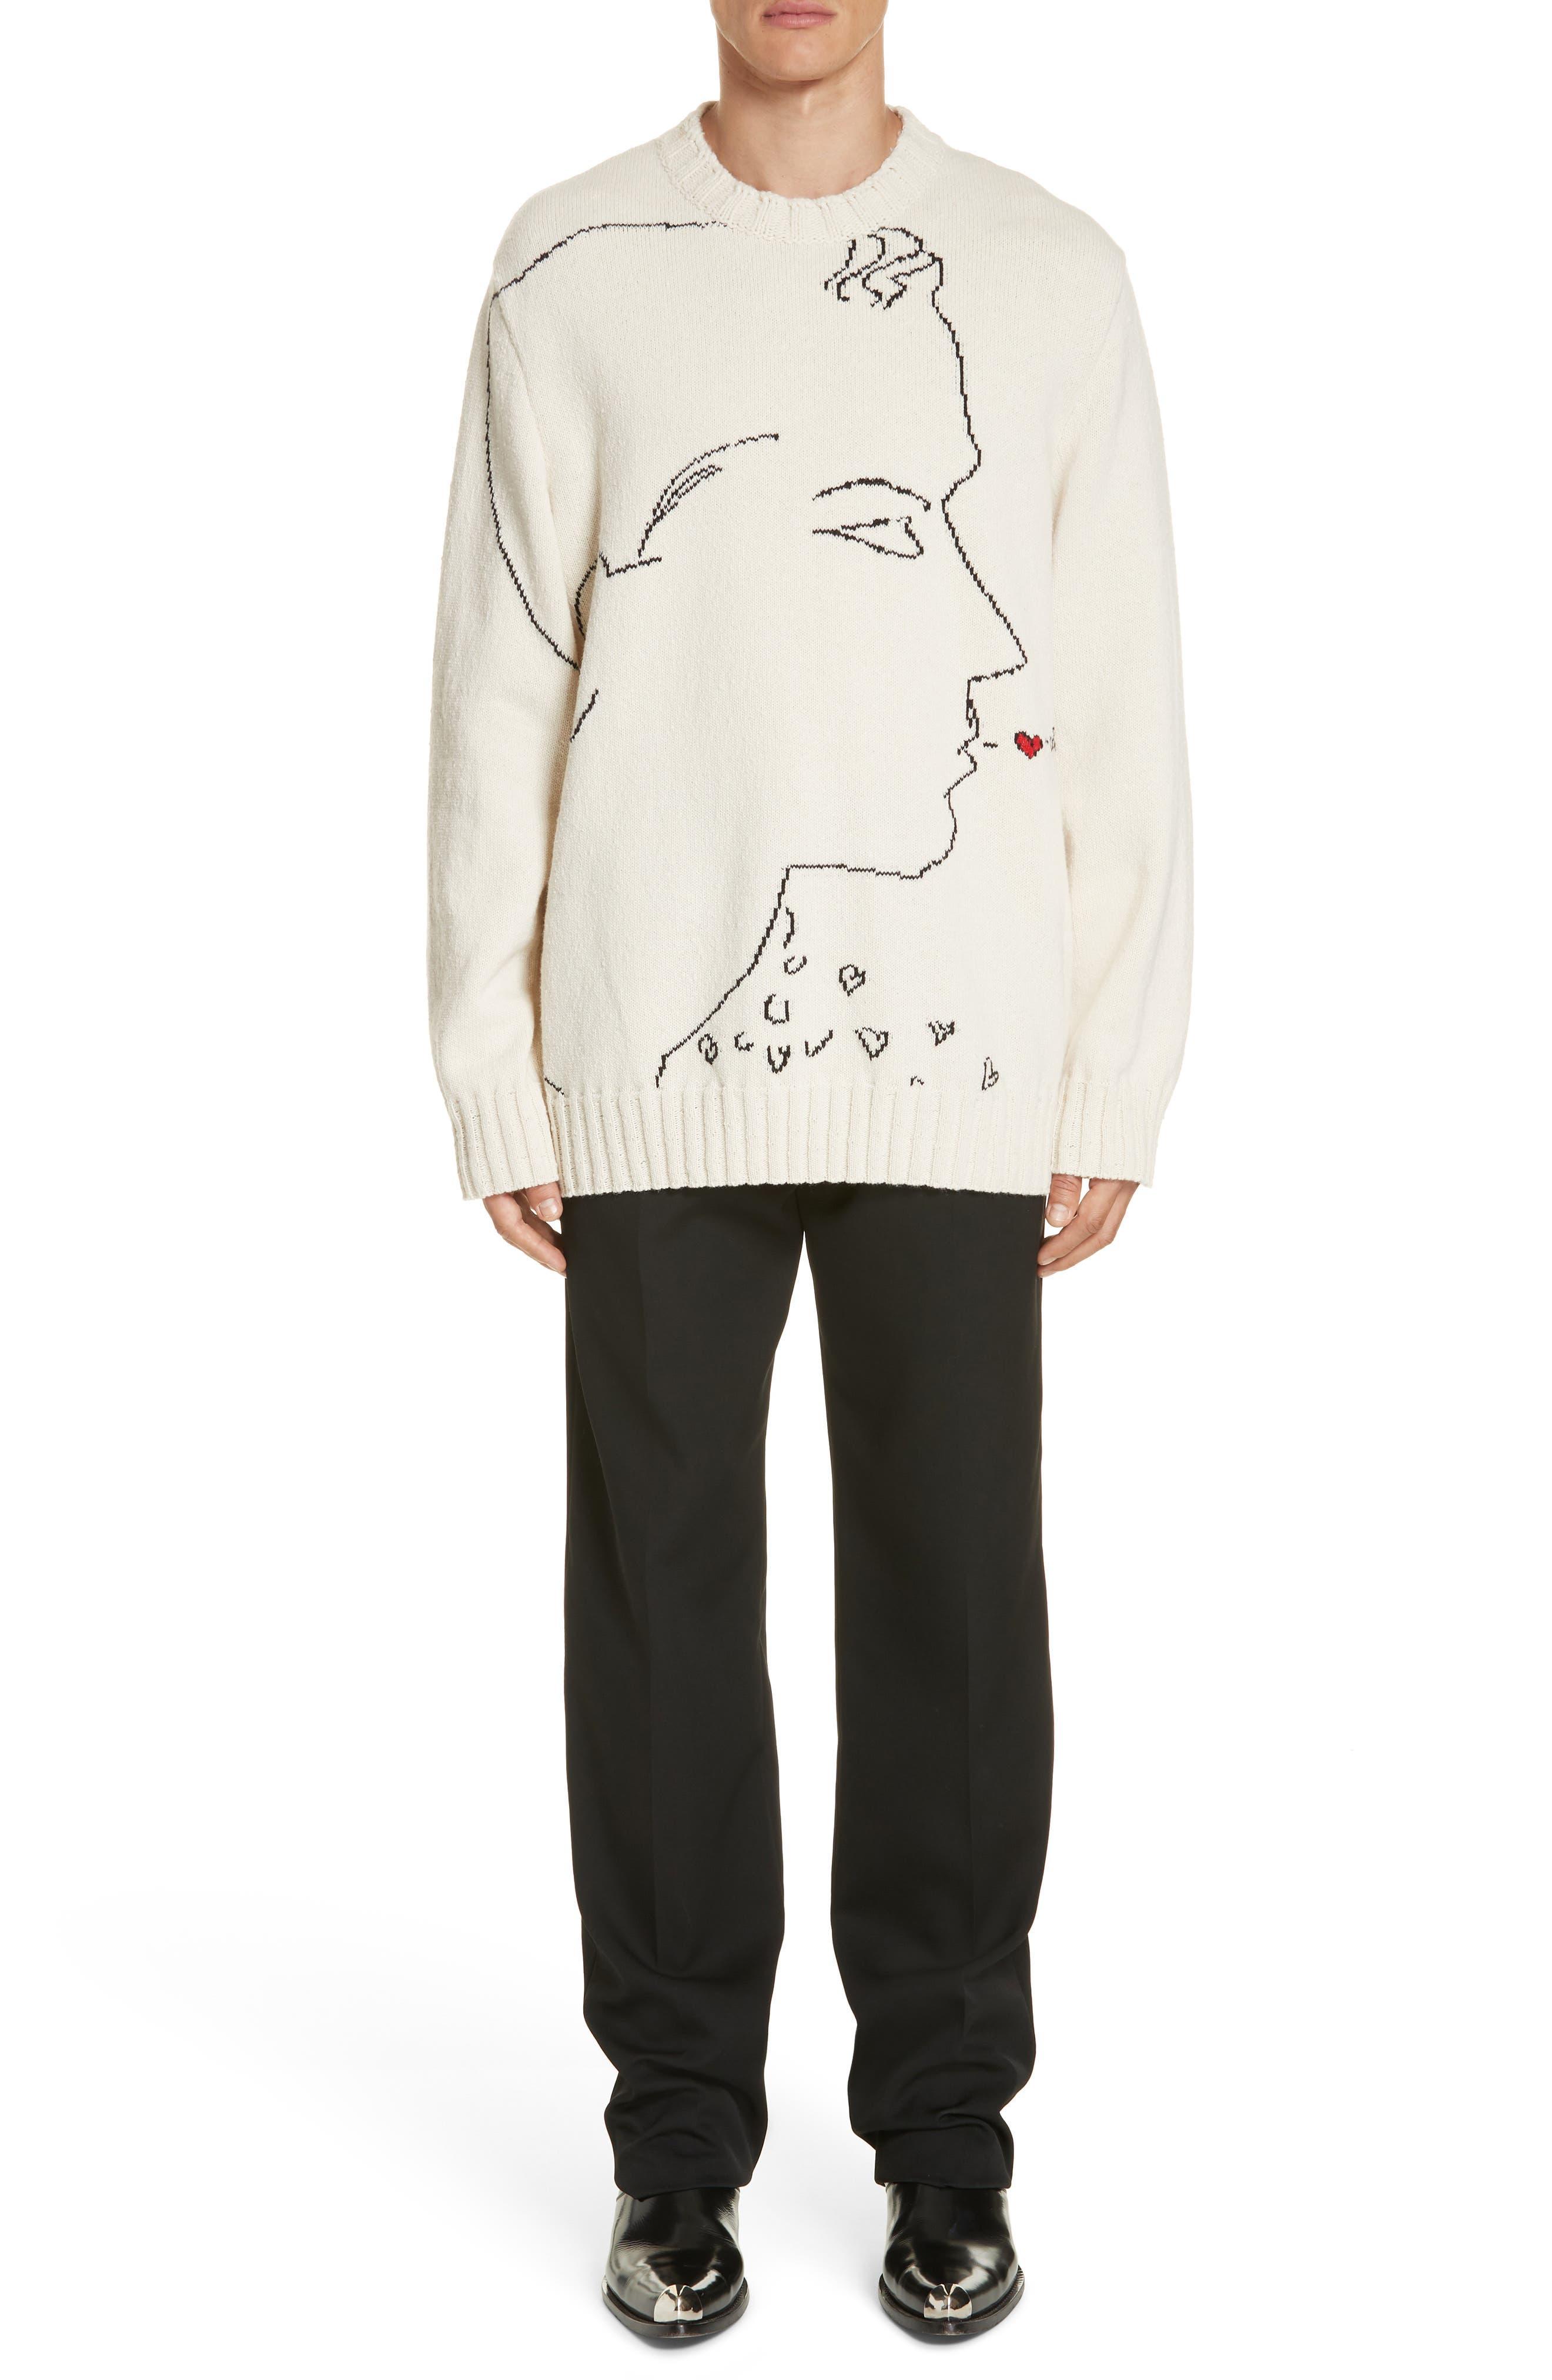 CALVIN KLEIN 205W39NYC,                             Print Wool Sweater,                             Alternate thumbnail 7, color,                             ECRU BLACK RED